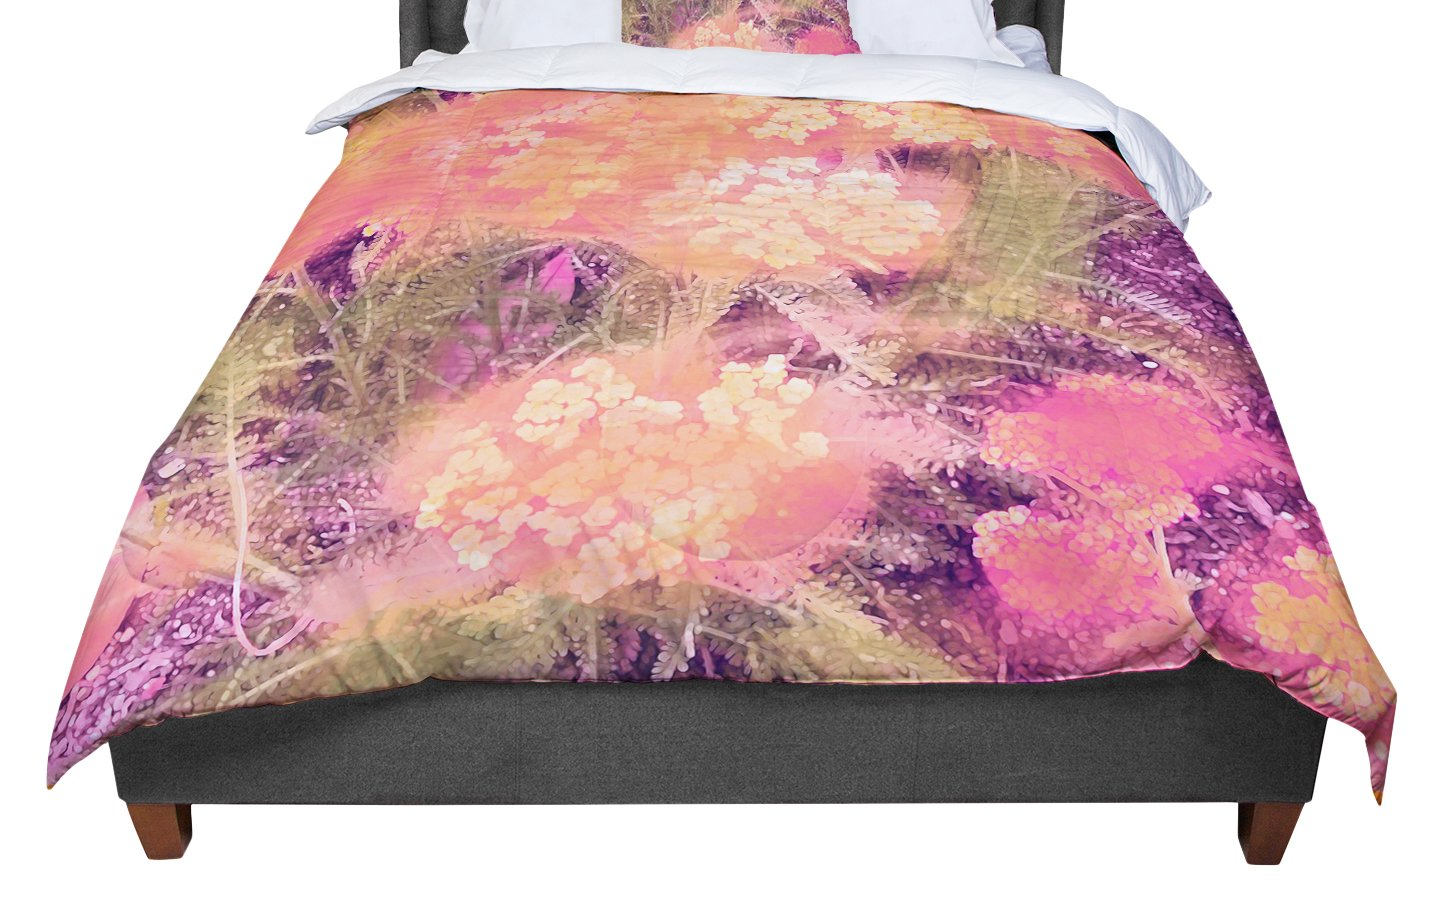 Kess InHouse Nina May Yellow Wildflowers Orange Pink Cotton Queen Duvet Cover 88 x 88